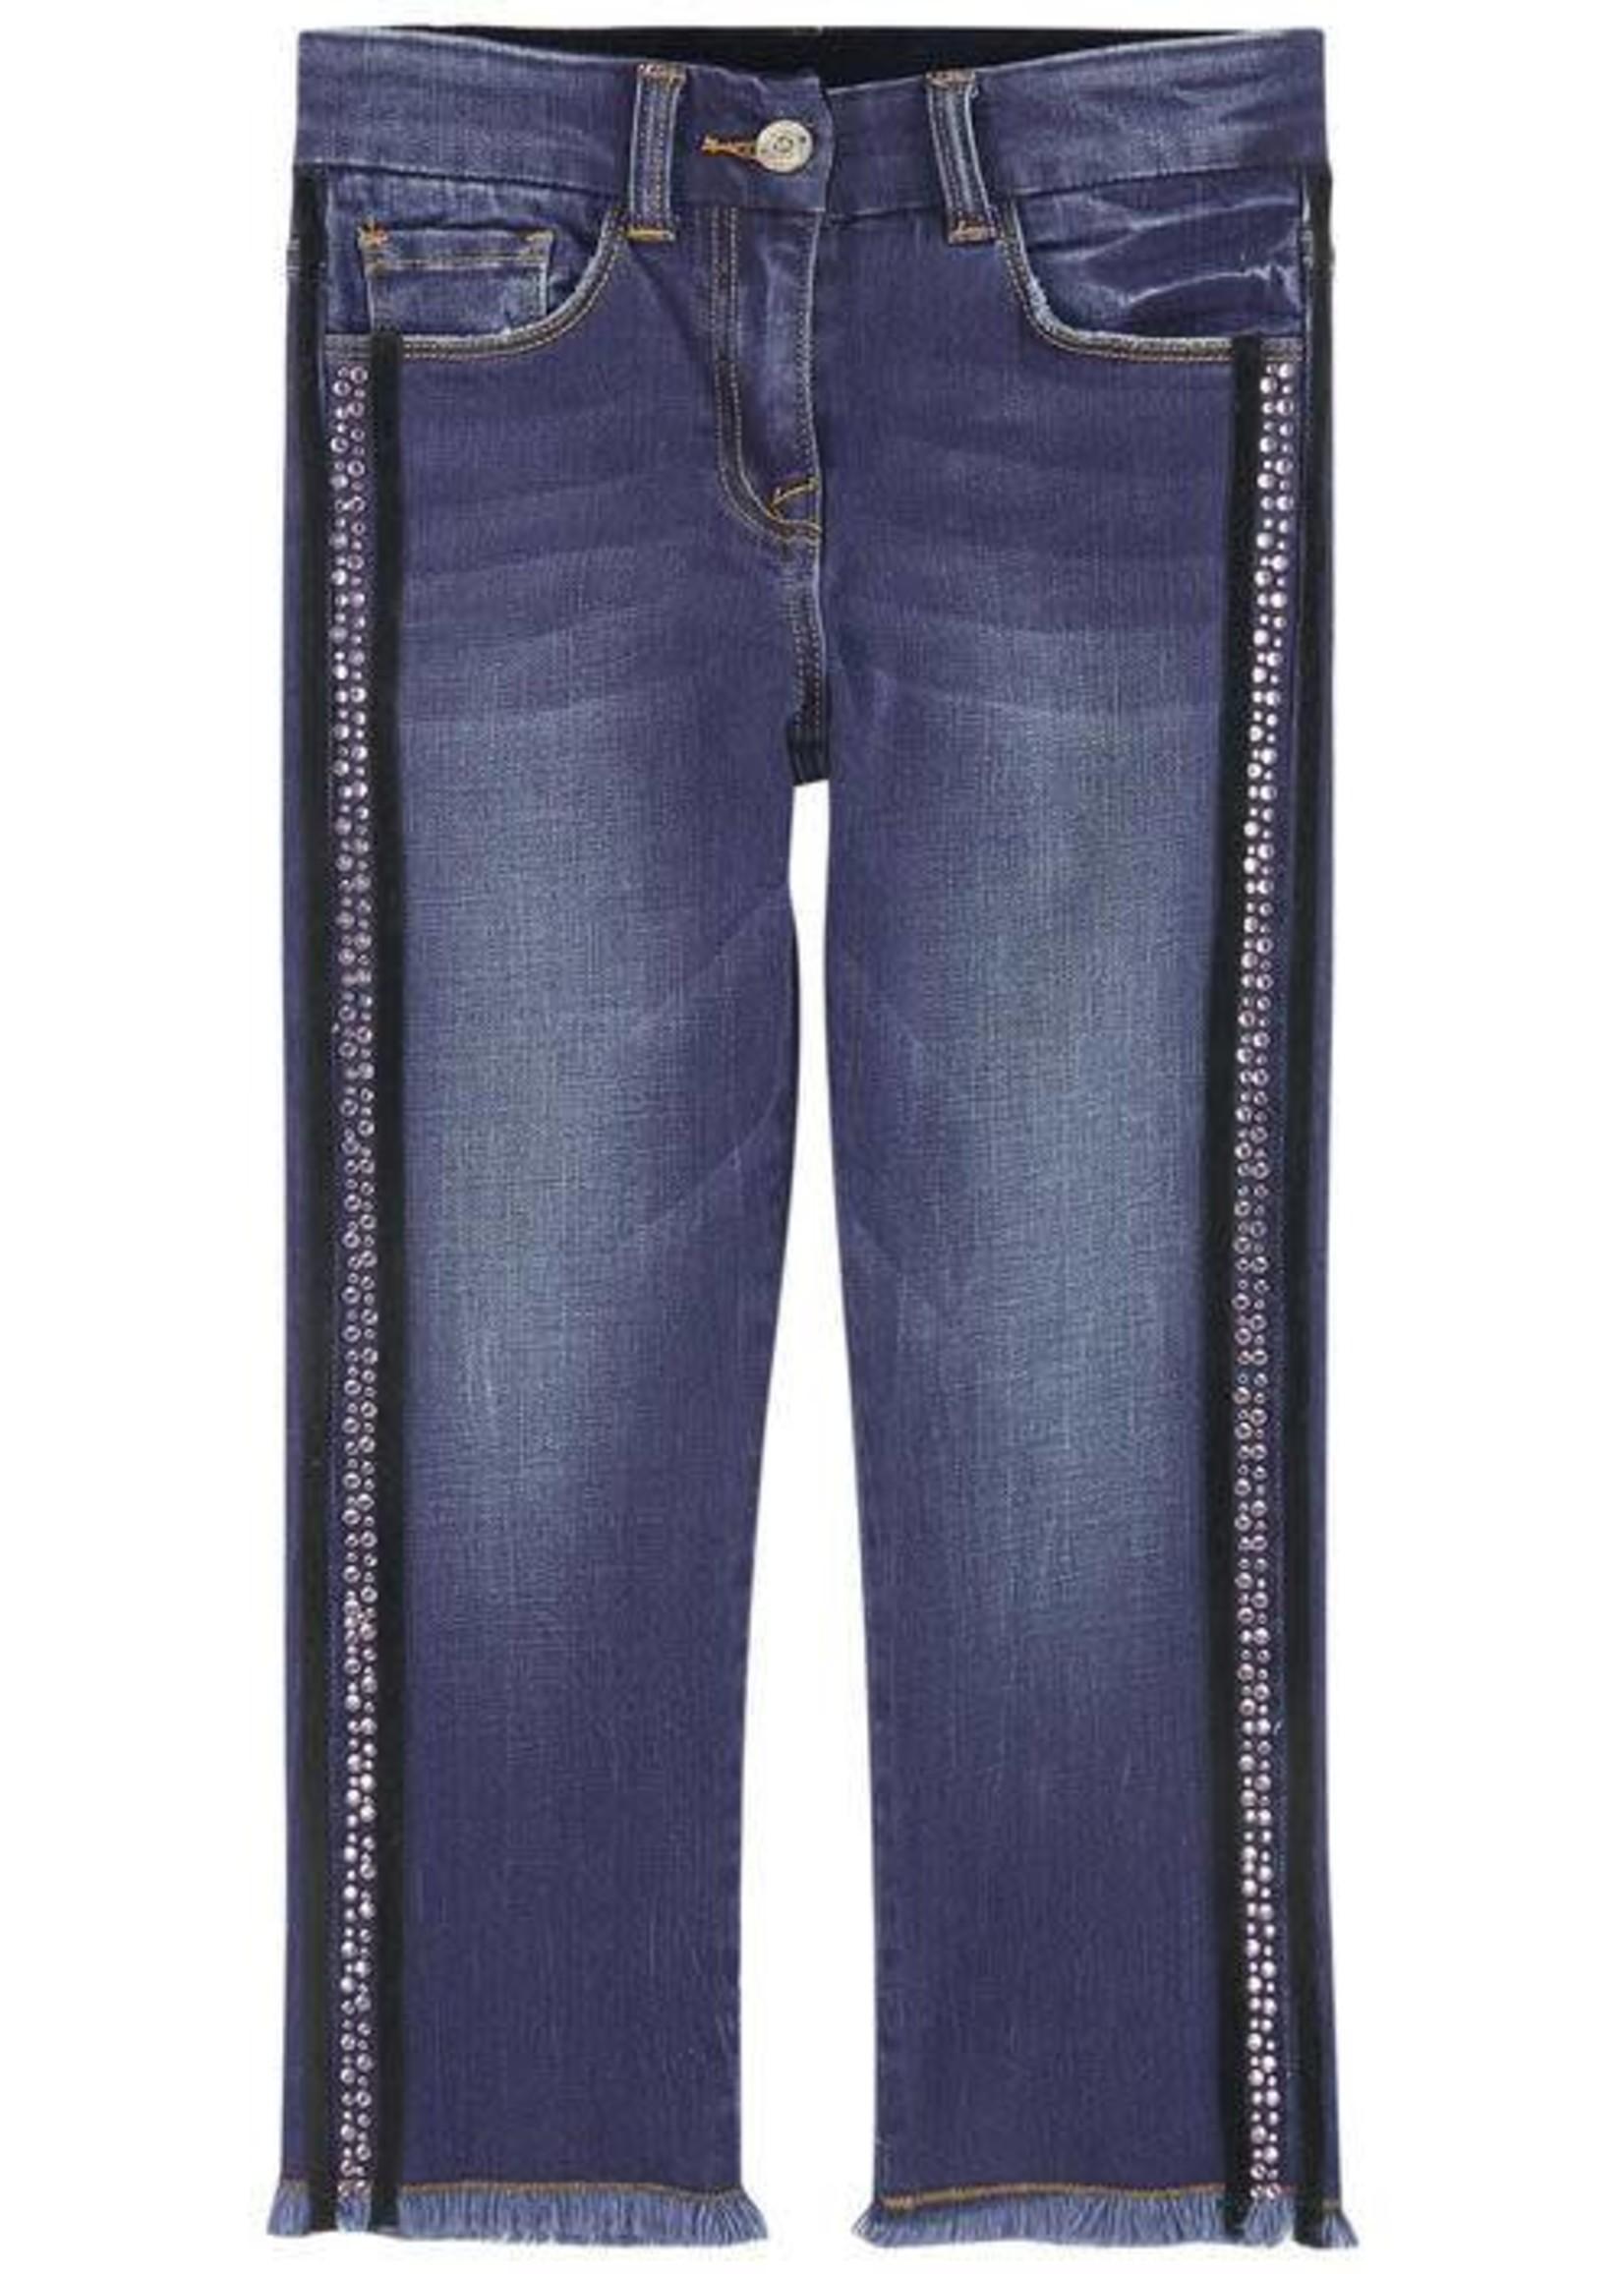 Monnalisa Monnalisa Slim Fit Jeans